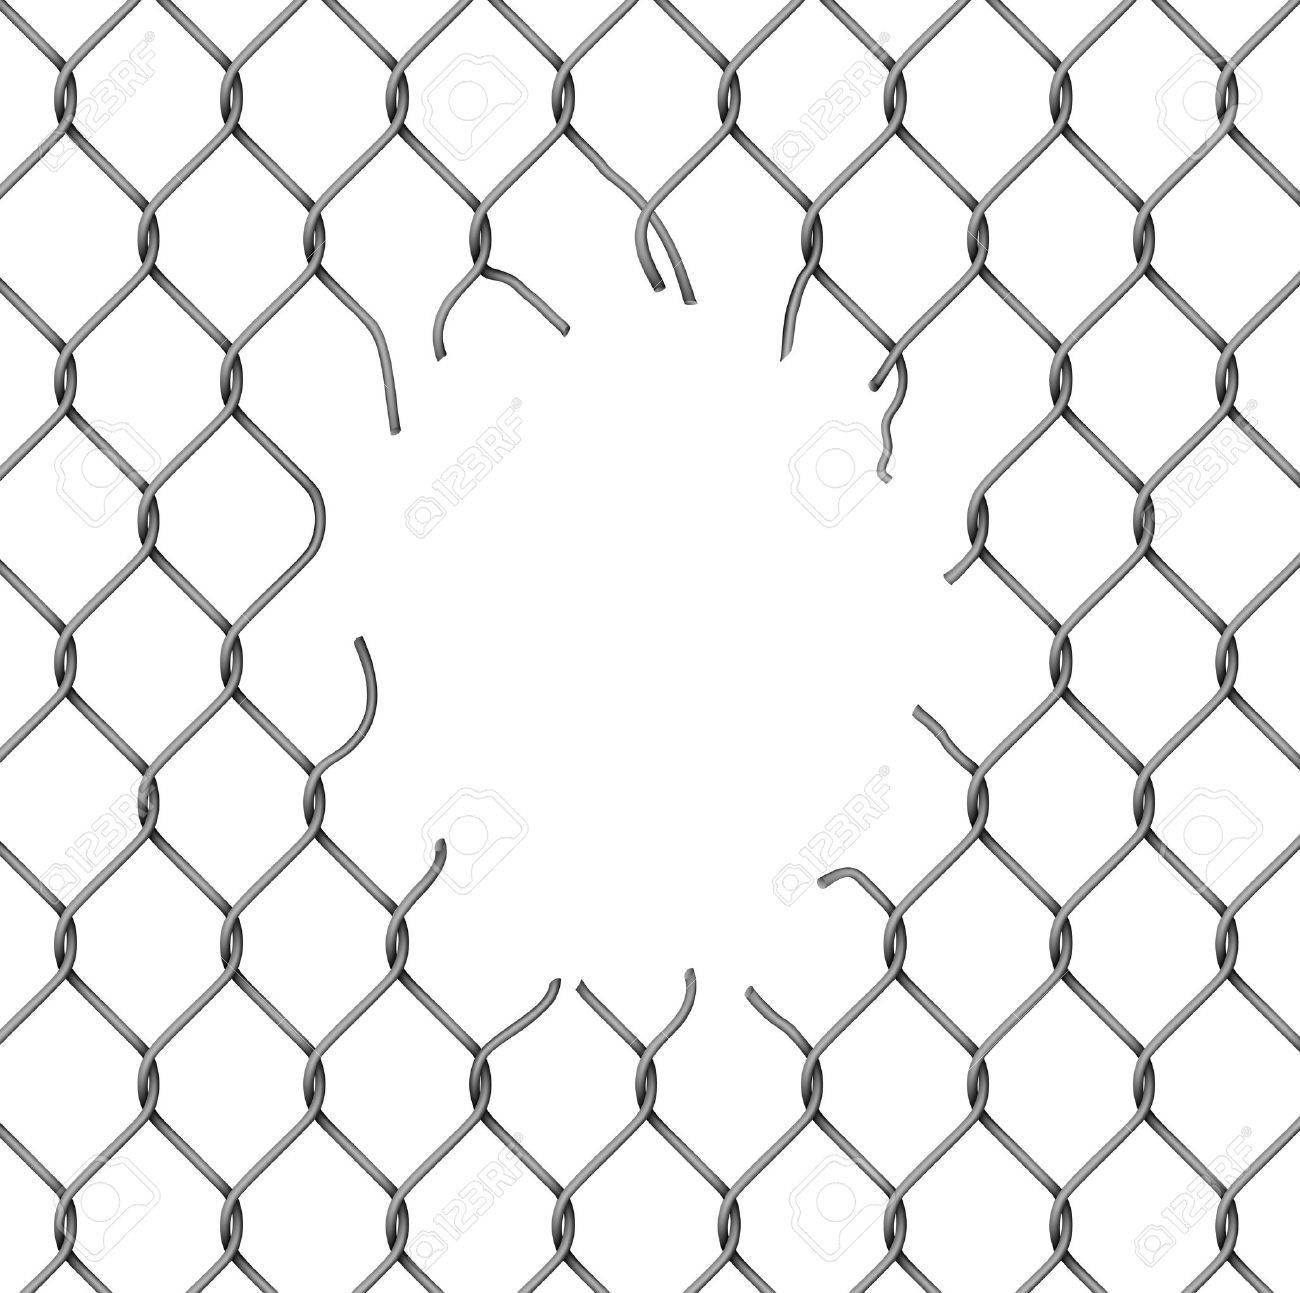 torn fence chain vector illustration stock vector 22156788 broken chain link png t14 broken